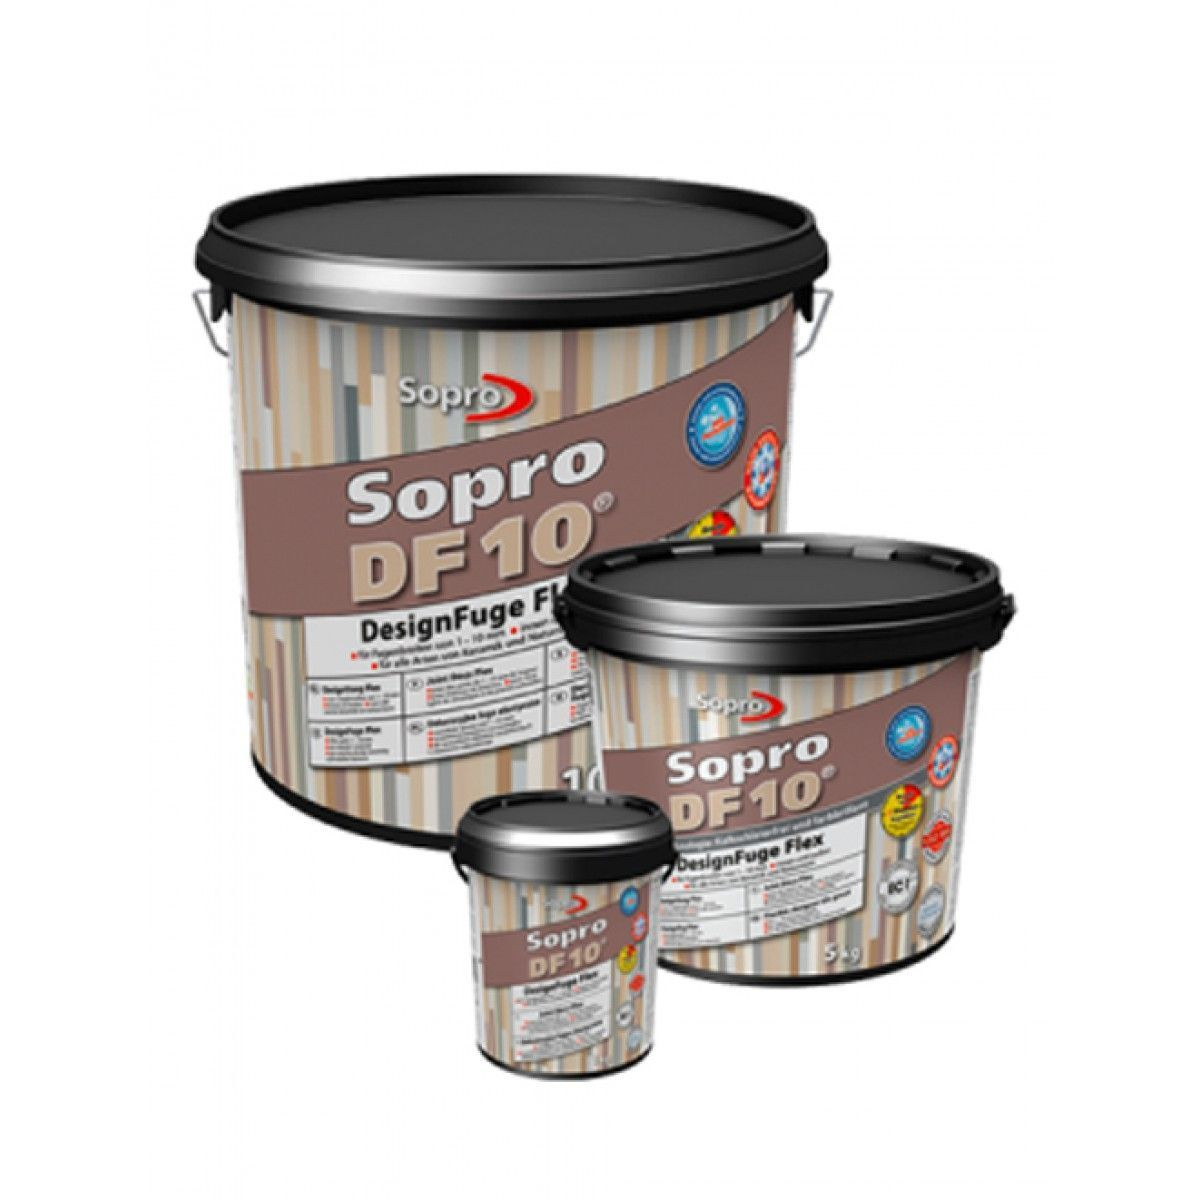 Sopro Voegmortel Sopro DF 10 Flexibel betongrijs nr. 14 1kg